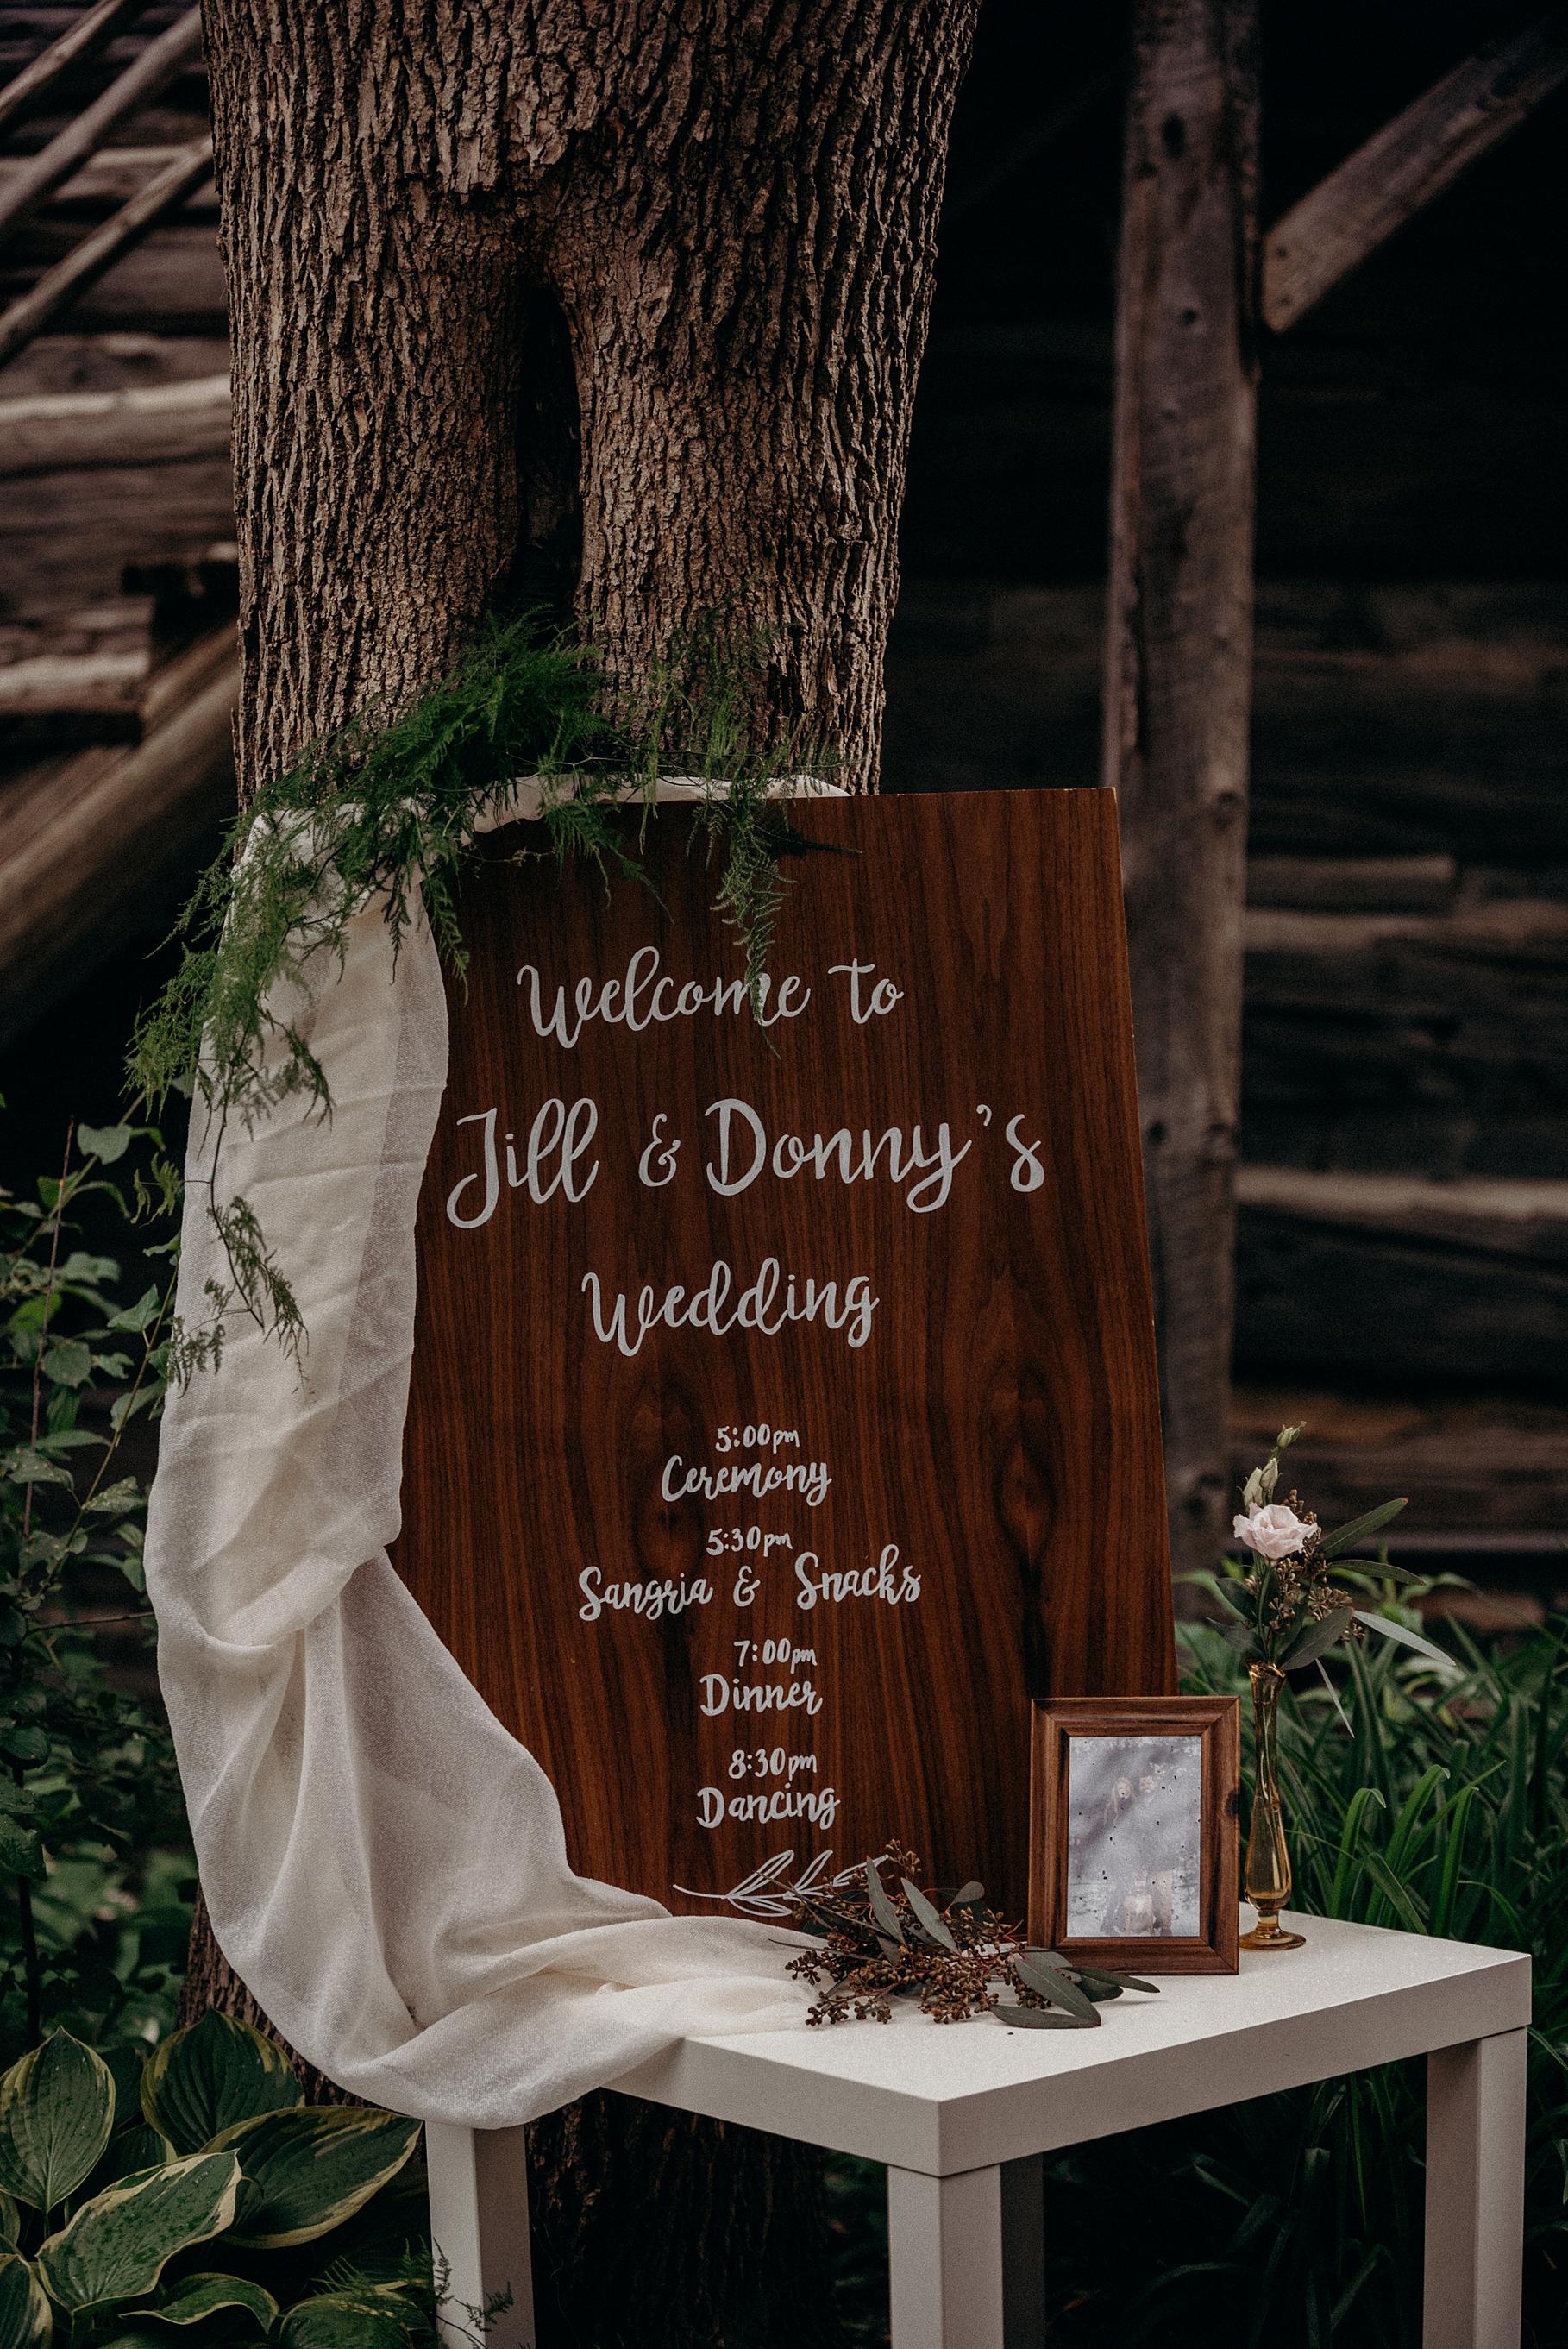 Saunders Farm Wedding Mocha Tree Studios Ottawa Toronto Montreal Wedding and Engagement Photographer and Videographer Dark Moody Intimate Authentic Modern Romantic Cinematic Best Candid 2